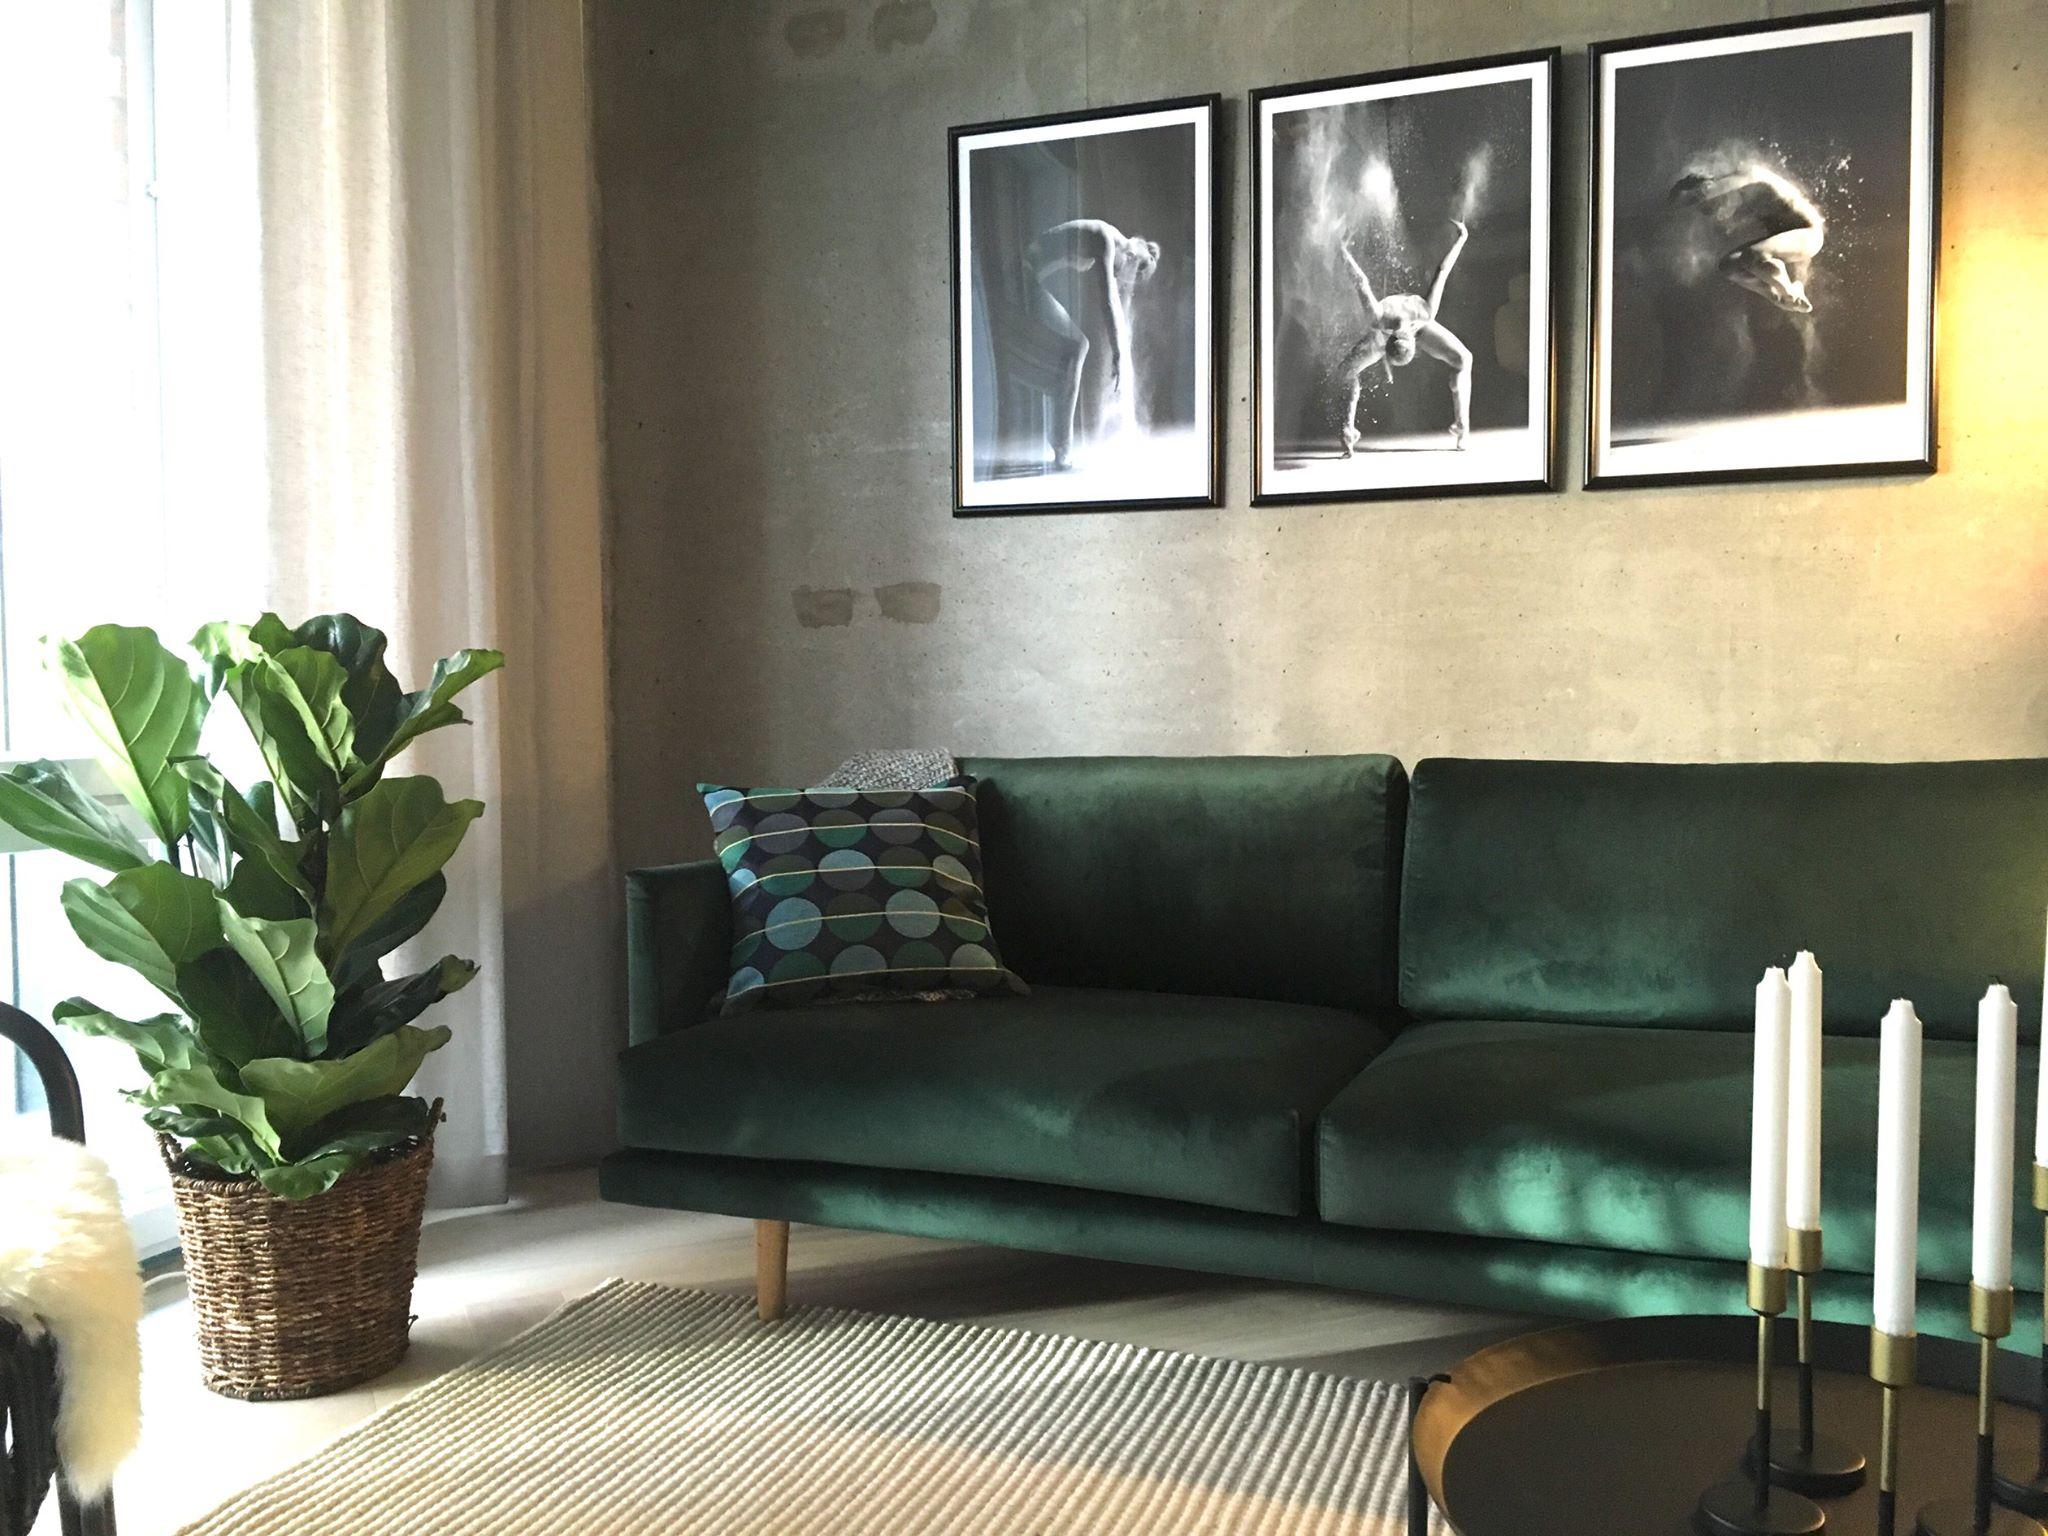 Hakolan Lazy sohva Design Moodin Loft by EKE